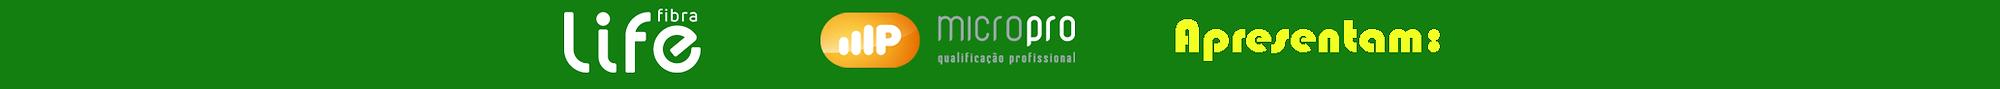 LifeMicroproApresentam.png